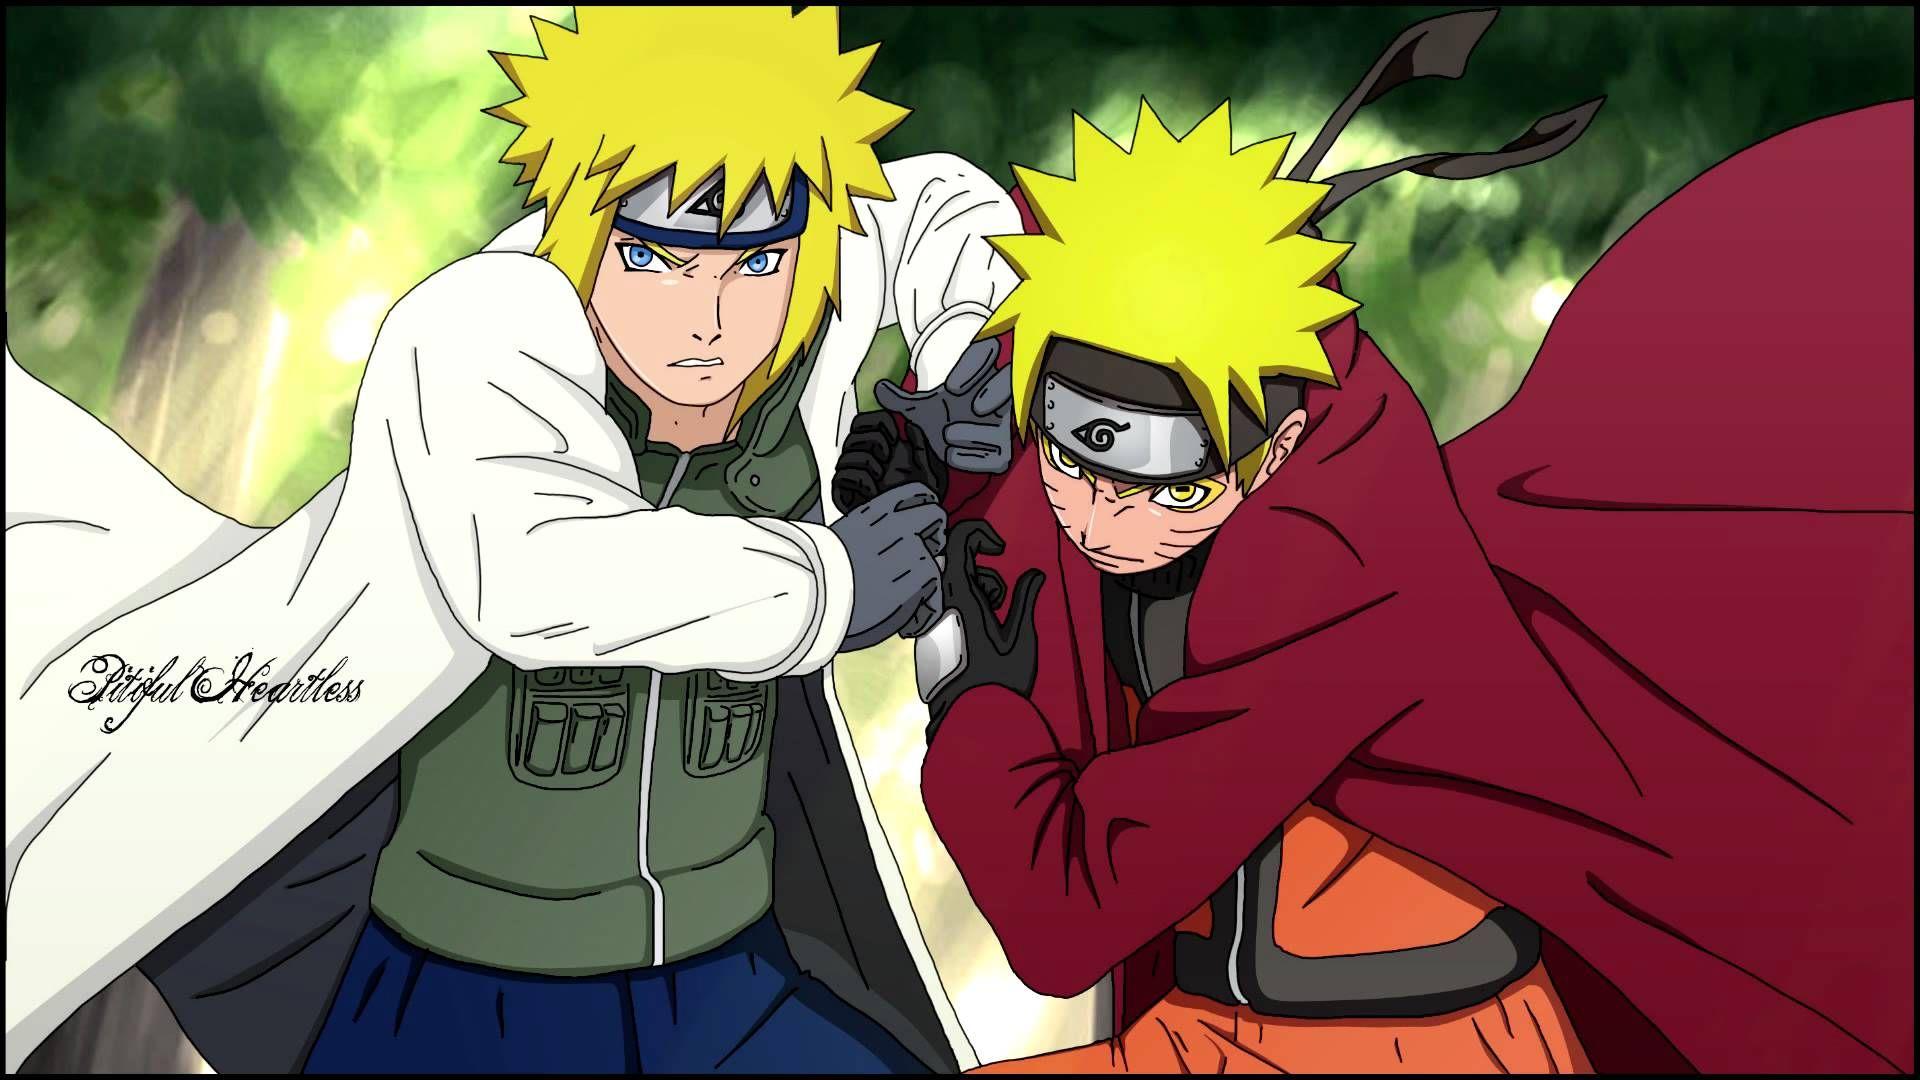 Naruto Shippuden Wallpaper Dengan Gambar Desain Karakter Gambar